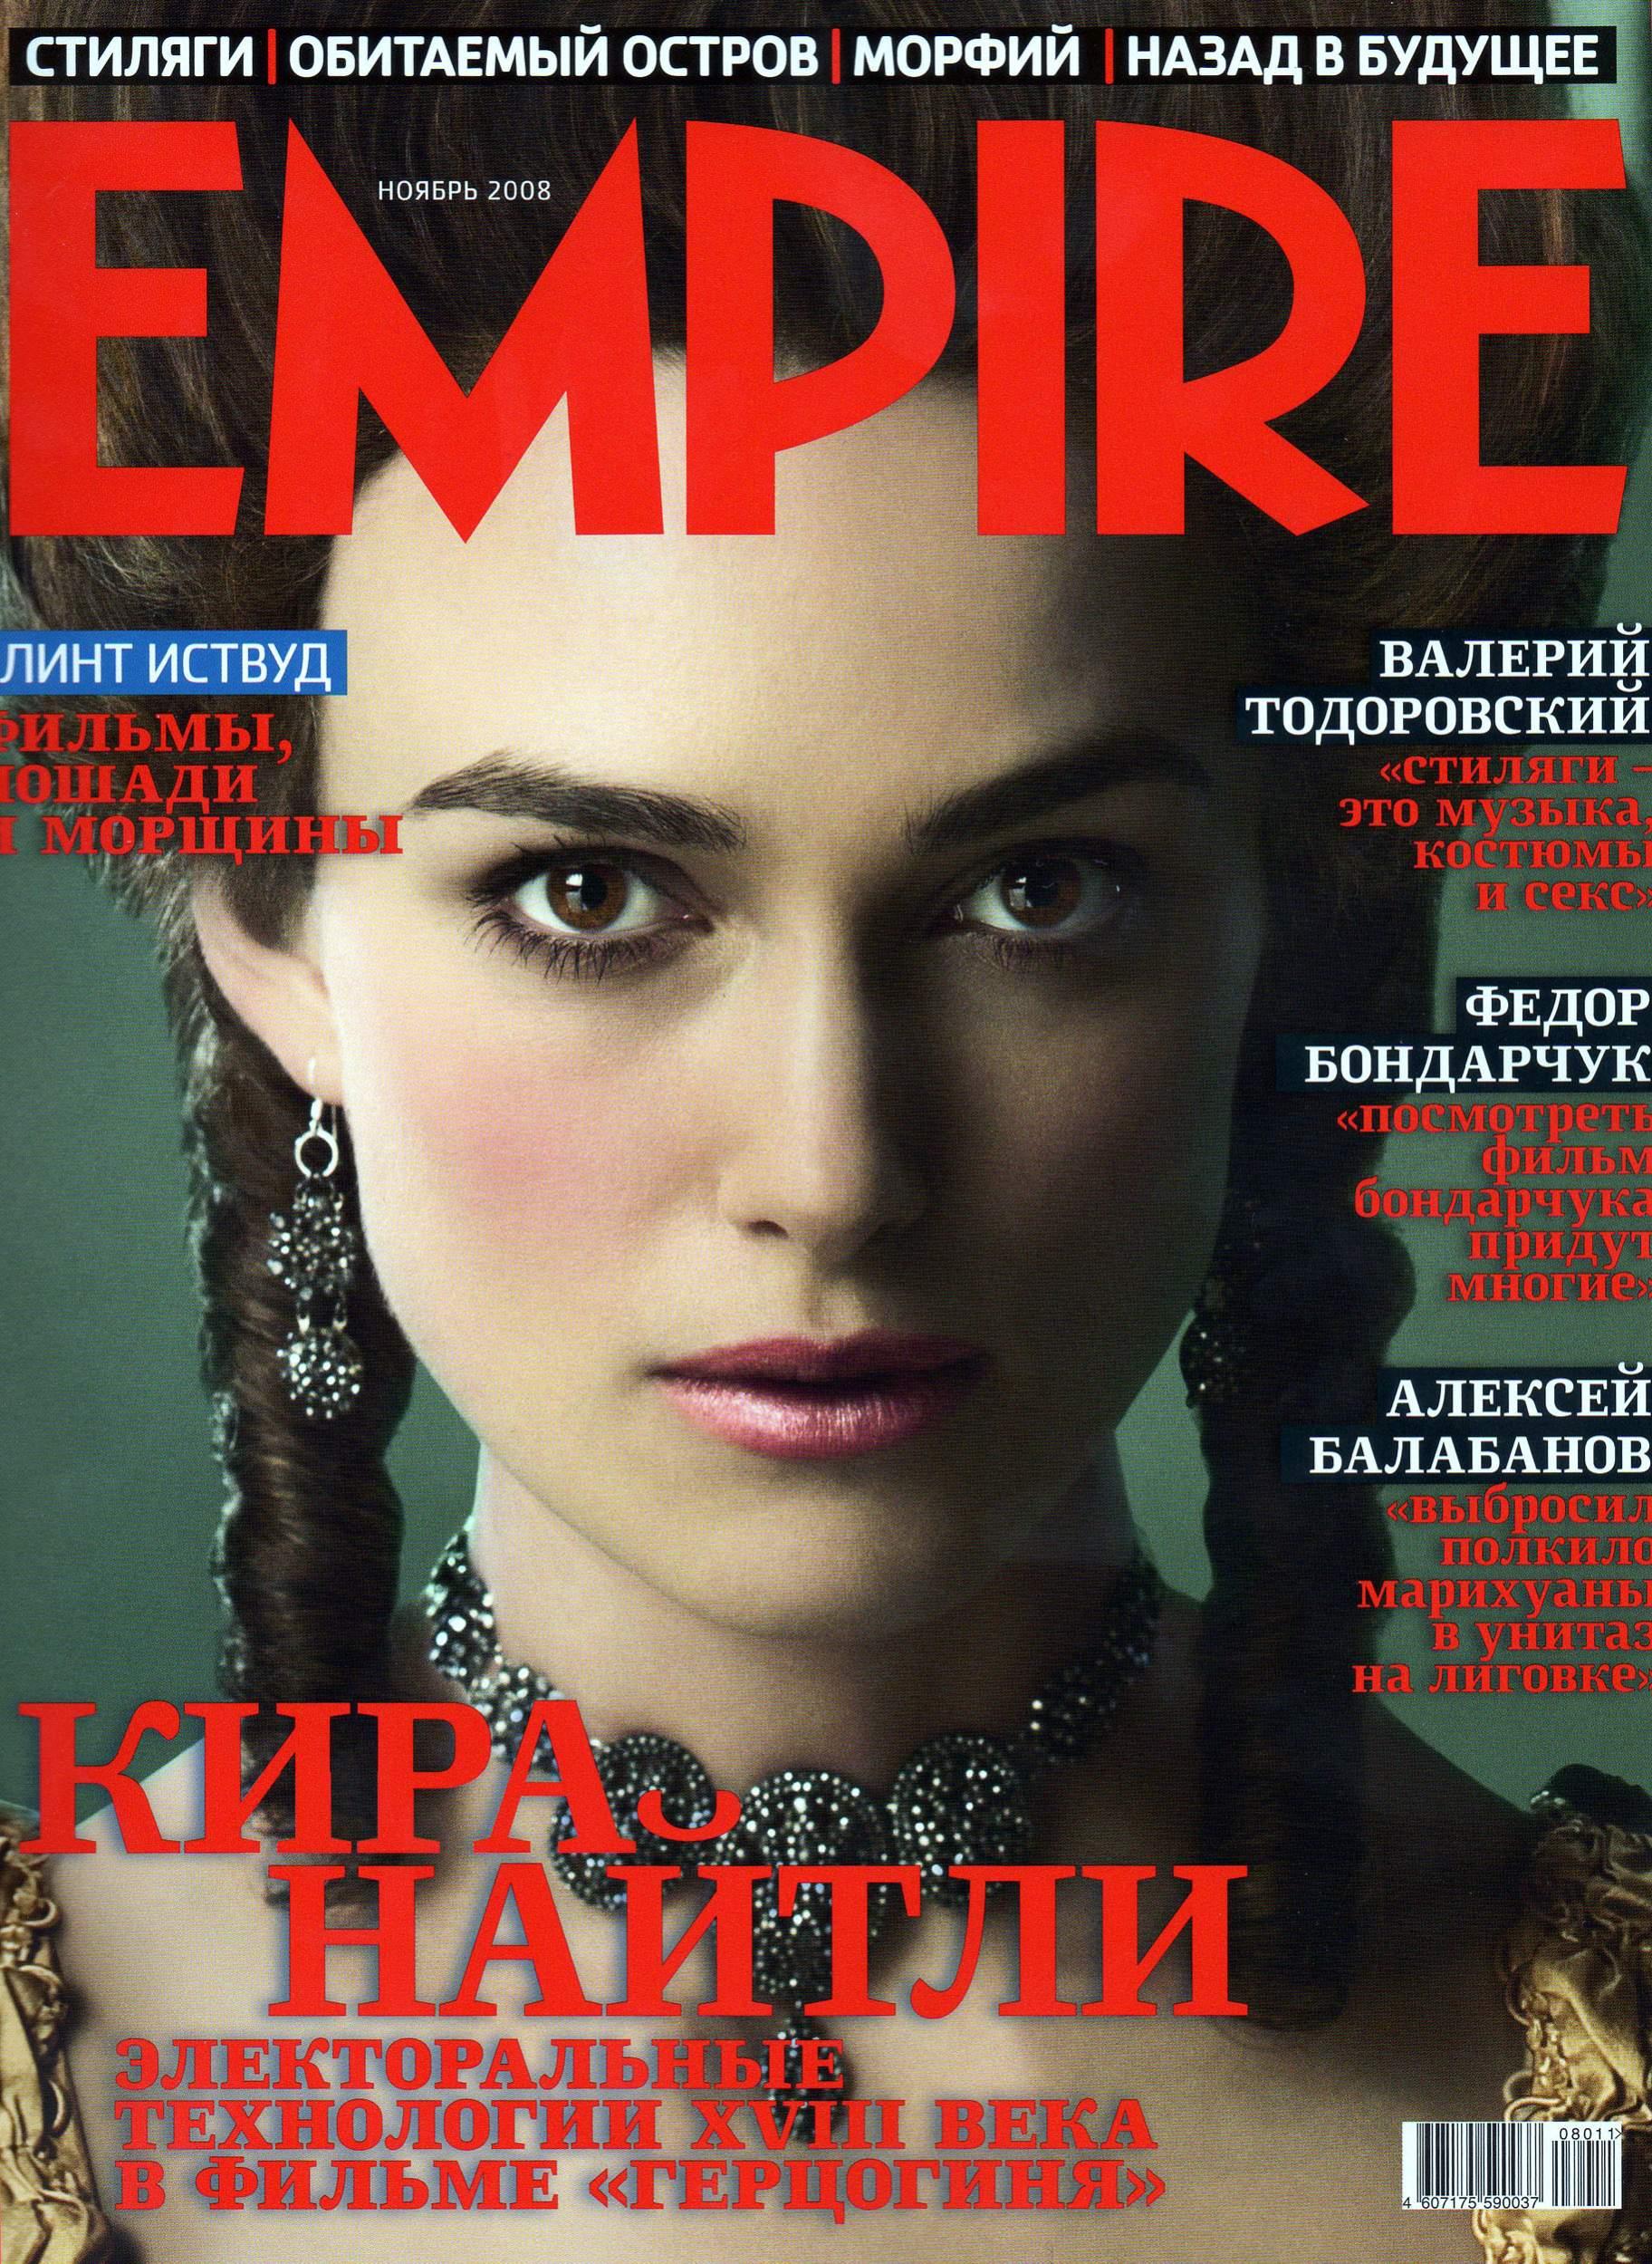 Film Magazine Research on emaze